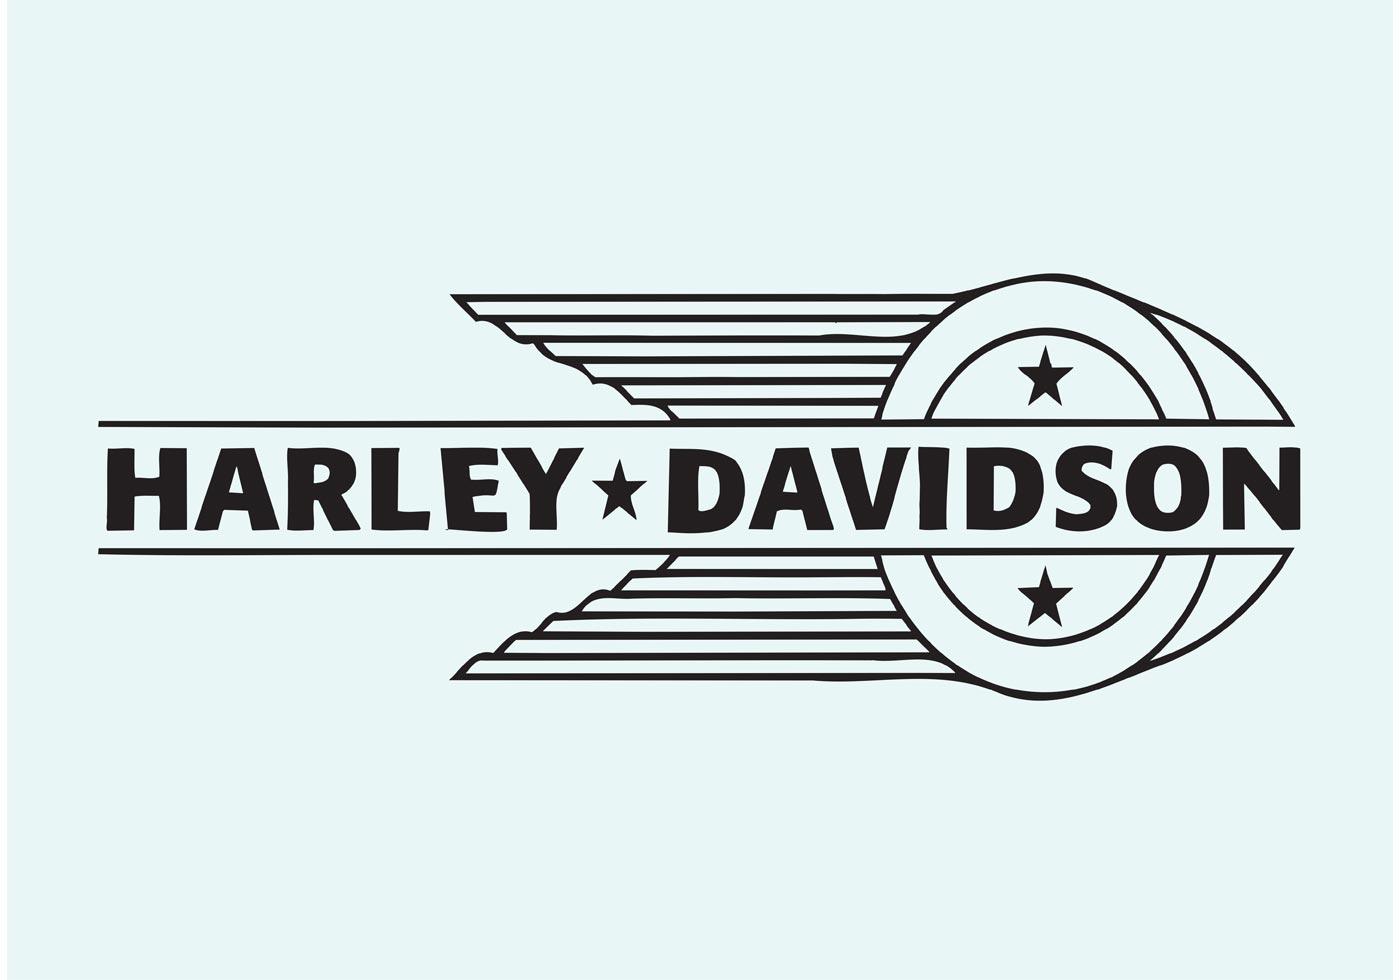 Harley Davidson Symbol: Harley Davidson Vector Logo